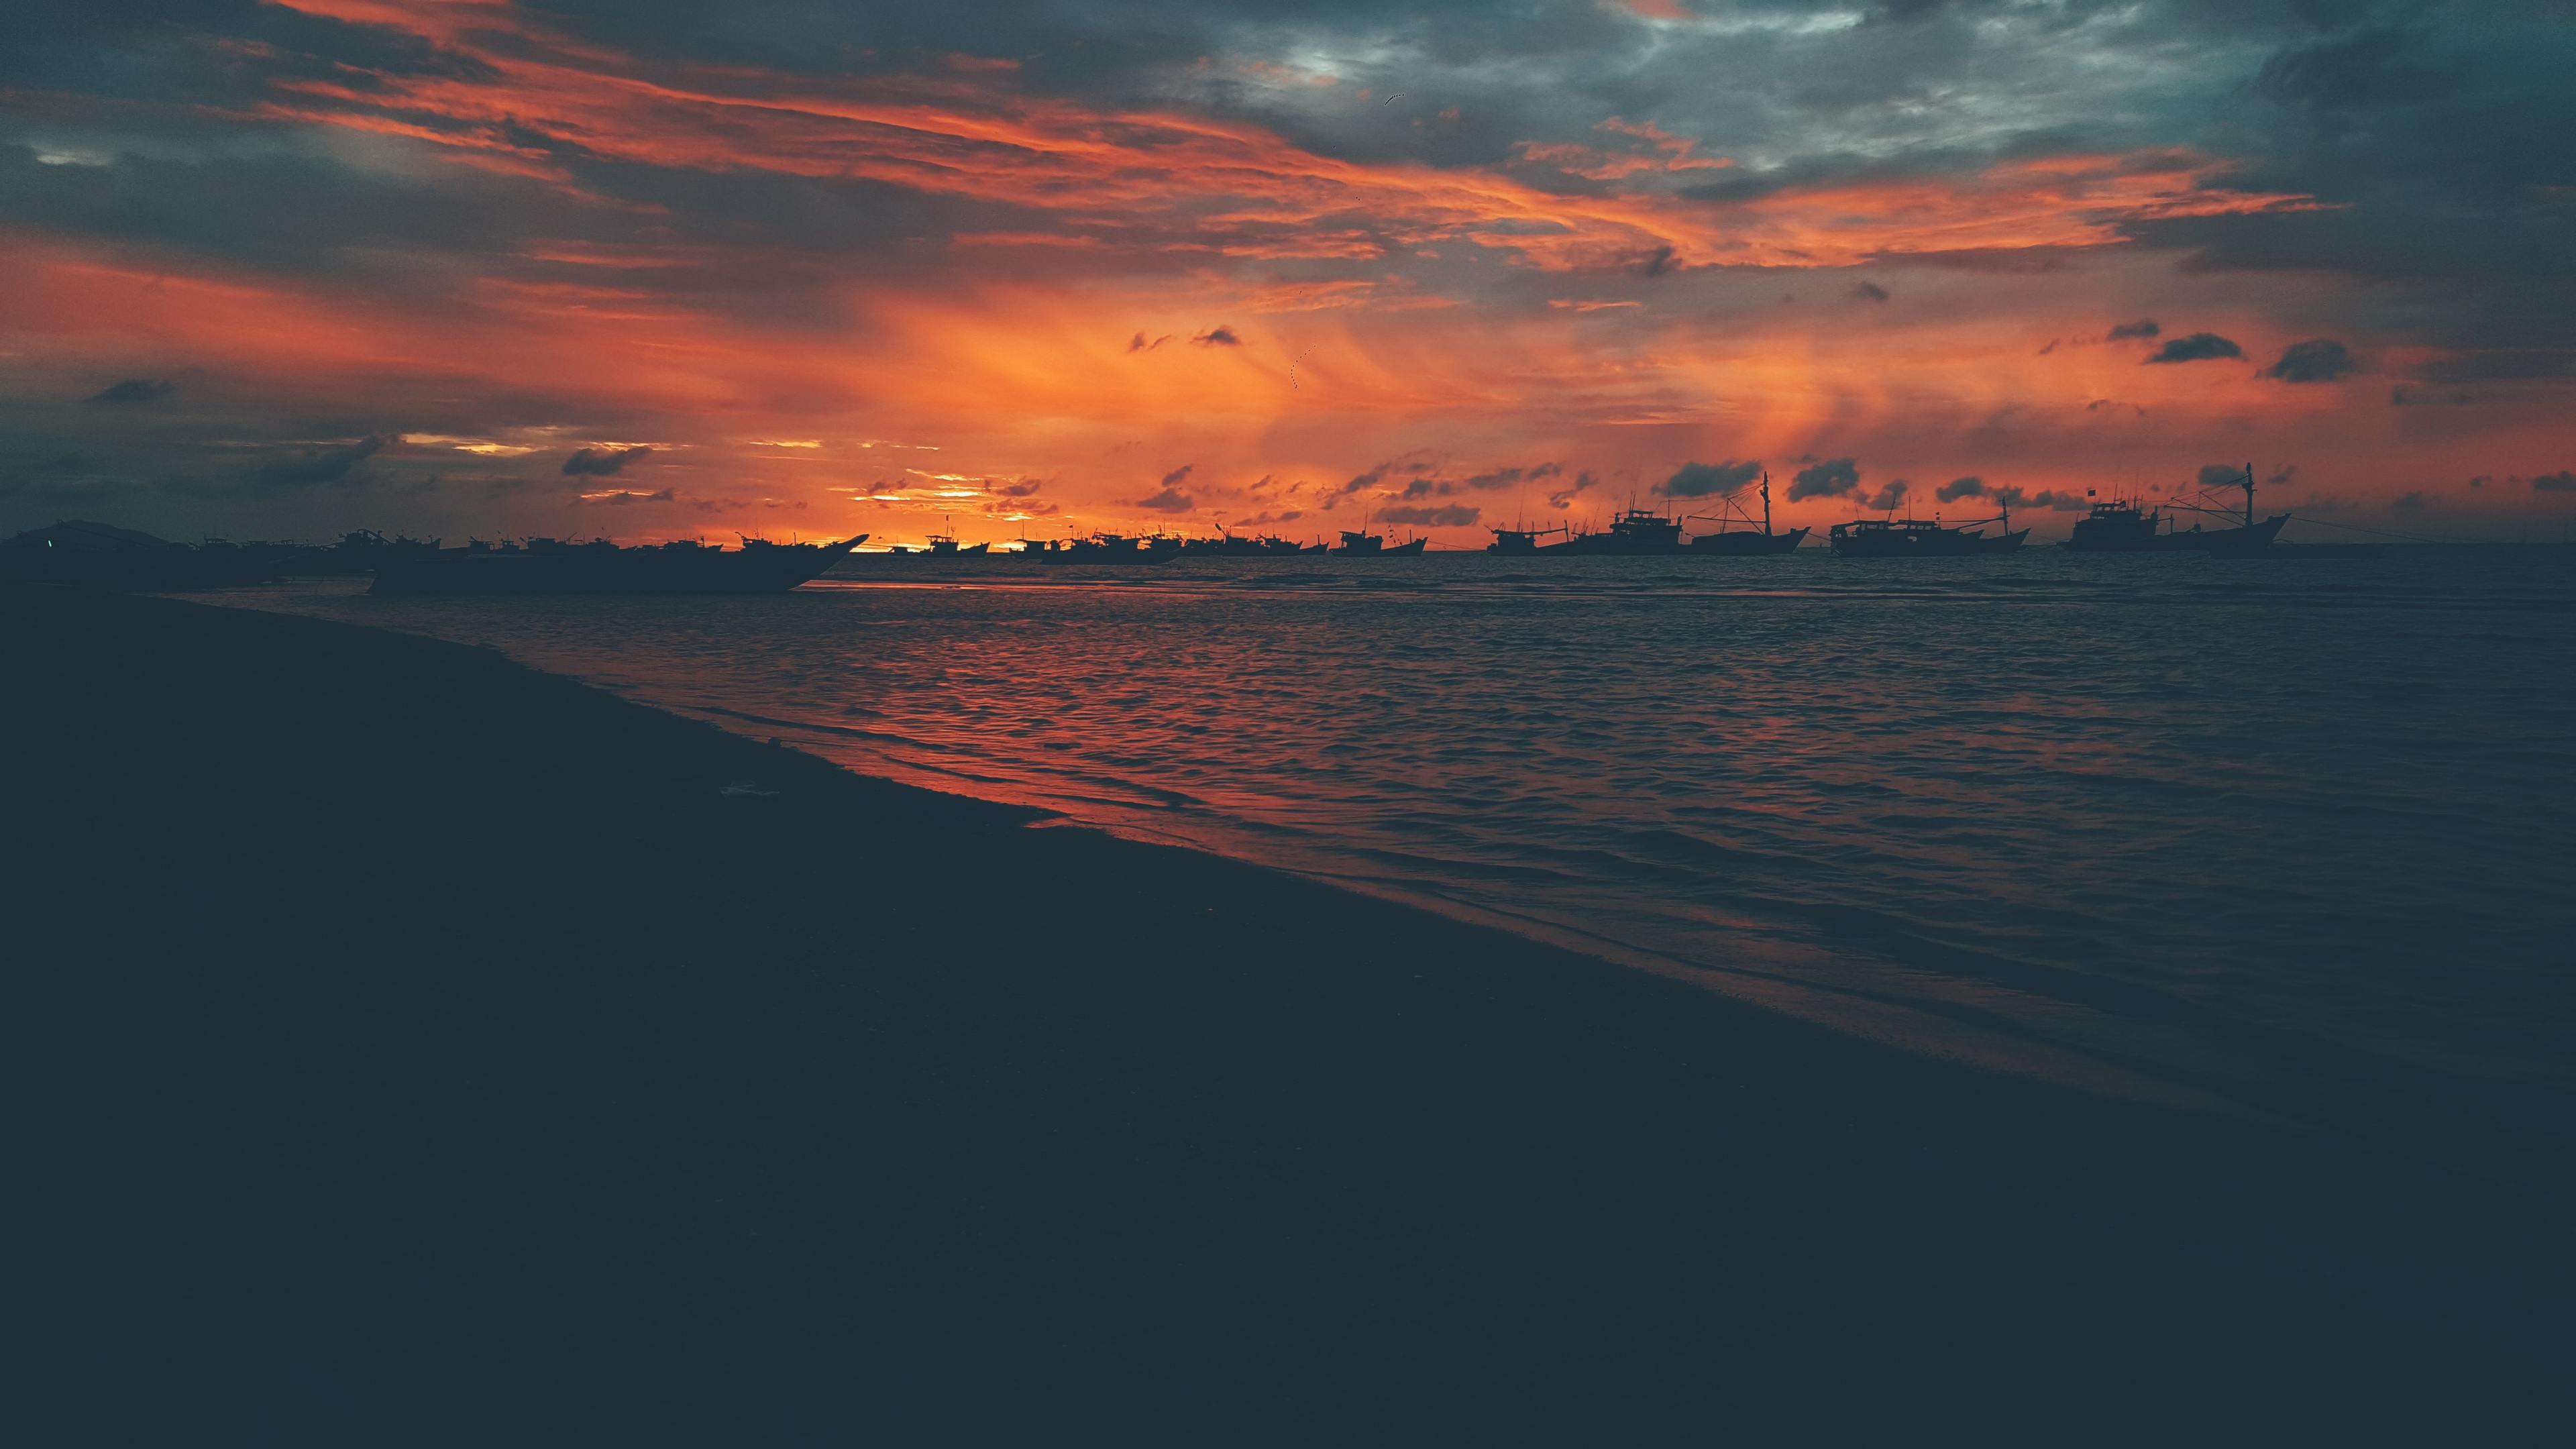 beach photo during golden hour 4k 1551643689 - Beach Photo During Golden Hour 4k - sunset wallpapers, photography wallpapers, nature wallpapers, hd-wallpapers, beach wallpapers, 4k-wallpapers